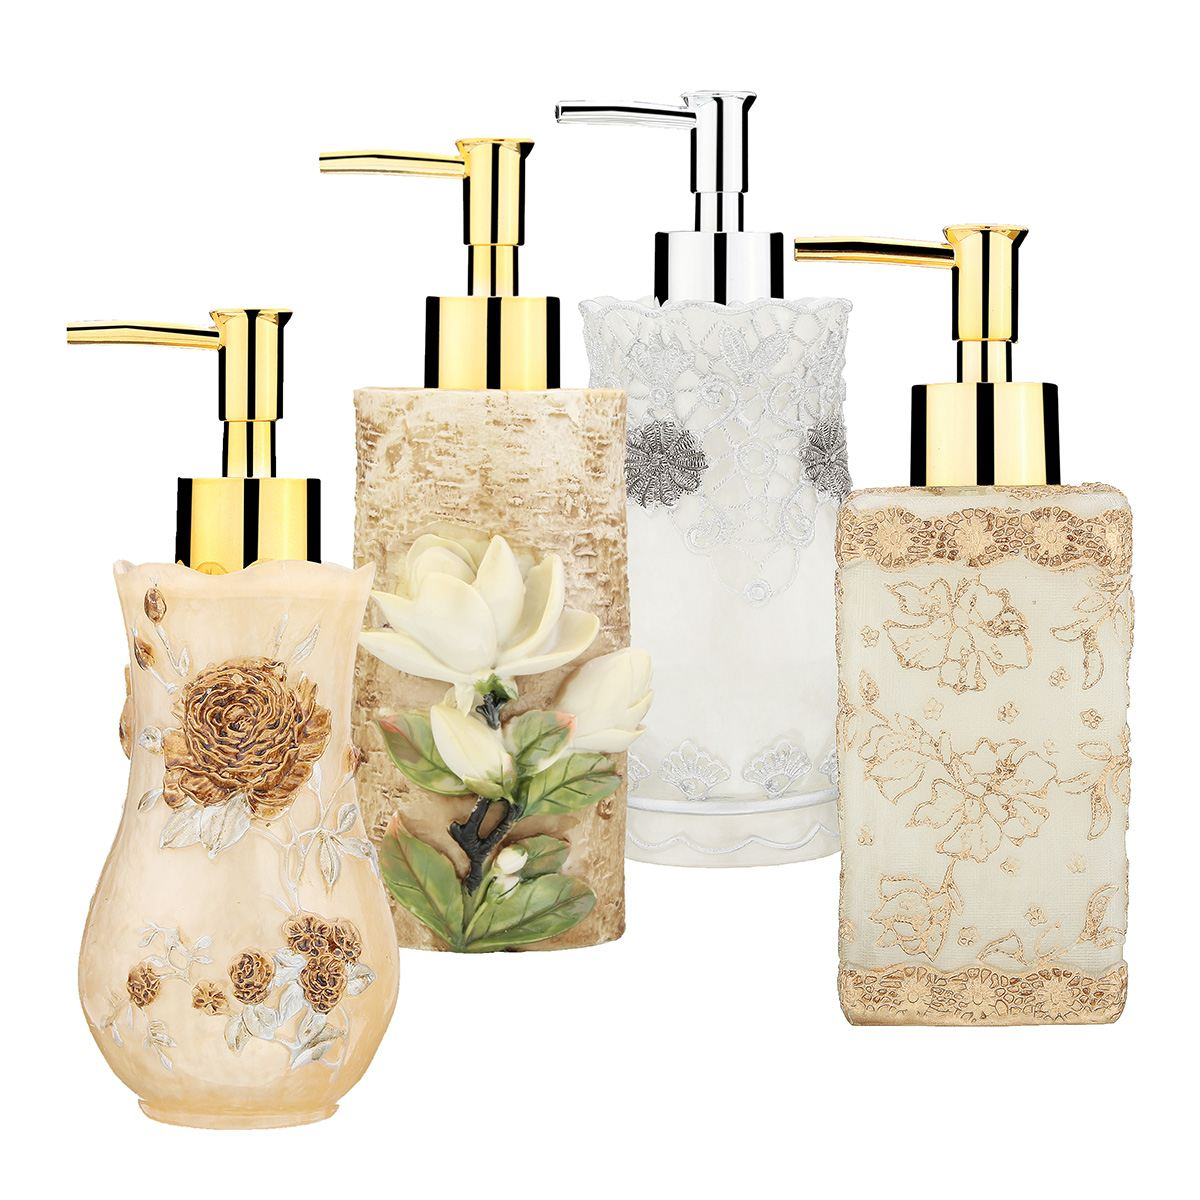 New 3D Flower Bathroom Home Hotel Liquid Soap Dispenser Sanitizer Resin Pump Lotion Shampoo Container Bottle